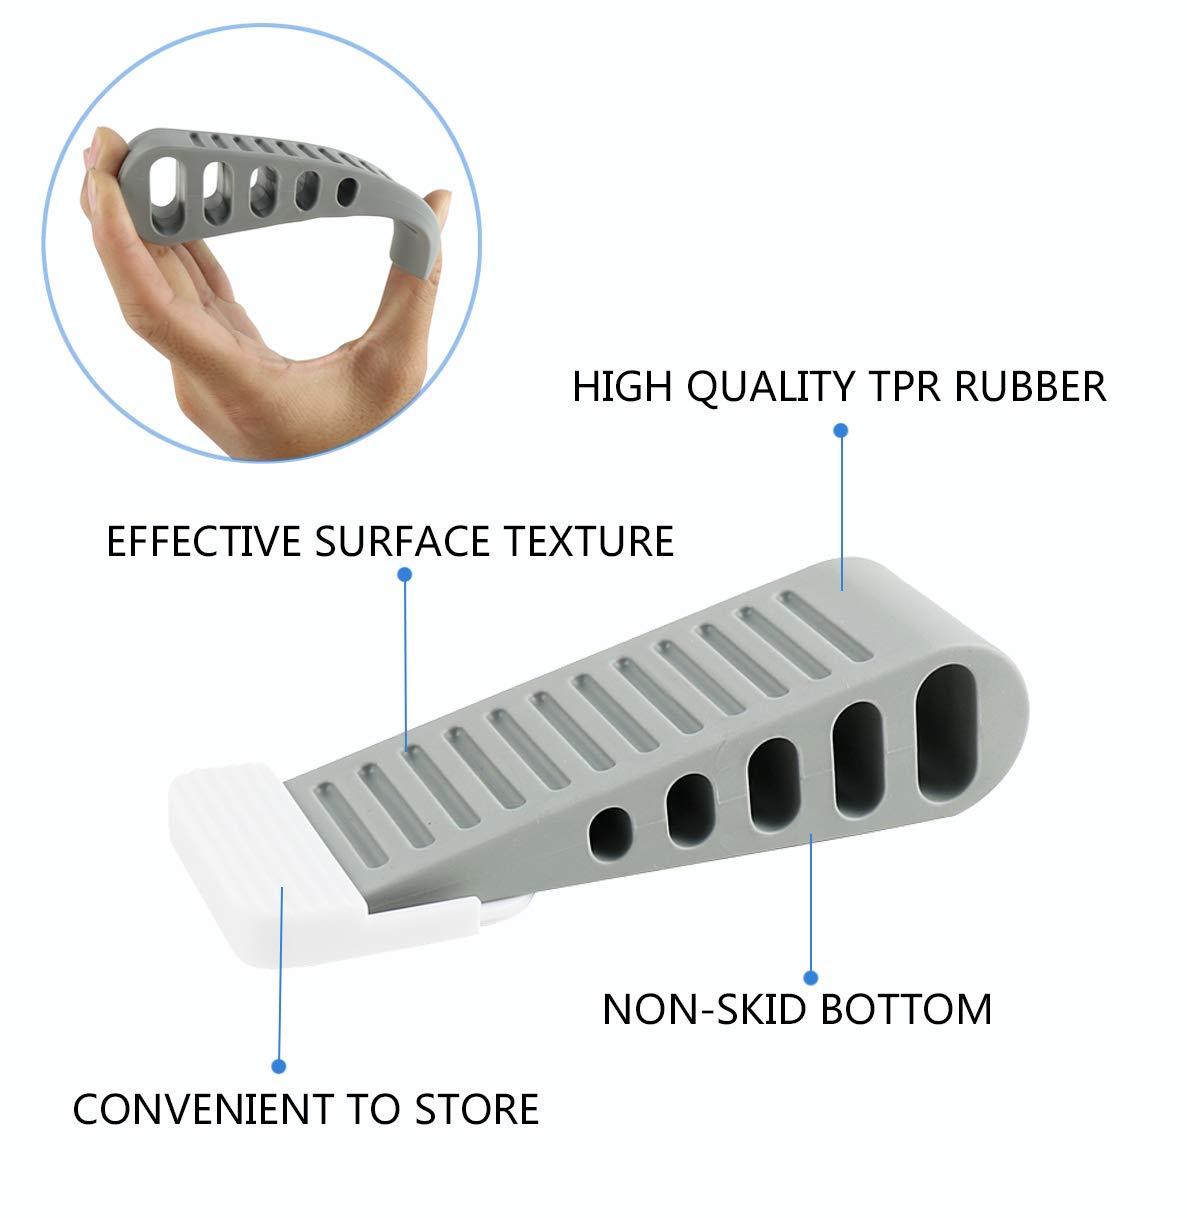 Black-4 Decorative Door Stoppers Premium Rubber Door Stops Prevents Pinching of Small Child Fingerss Non-Toxic No unpleasant Door Stopper Works on All Floor Surfaces